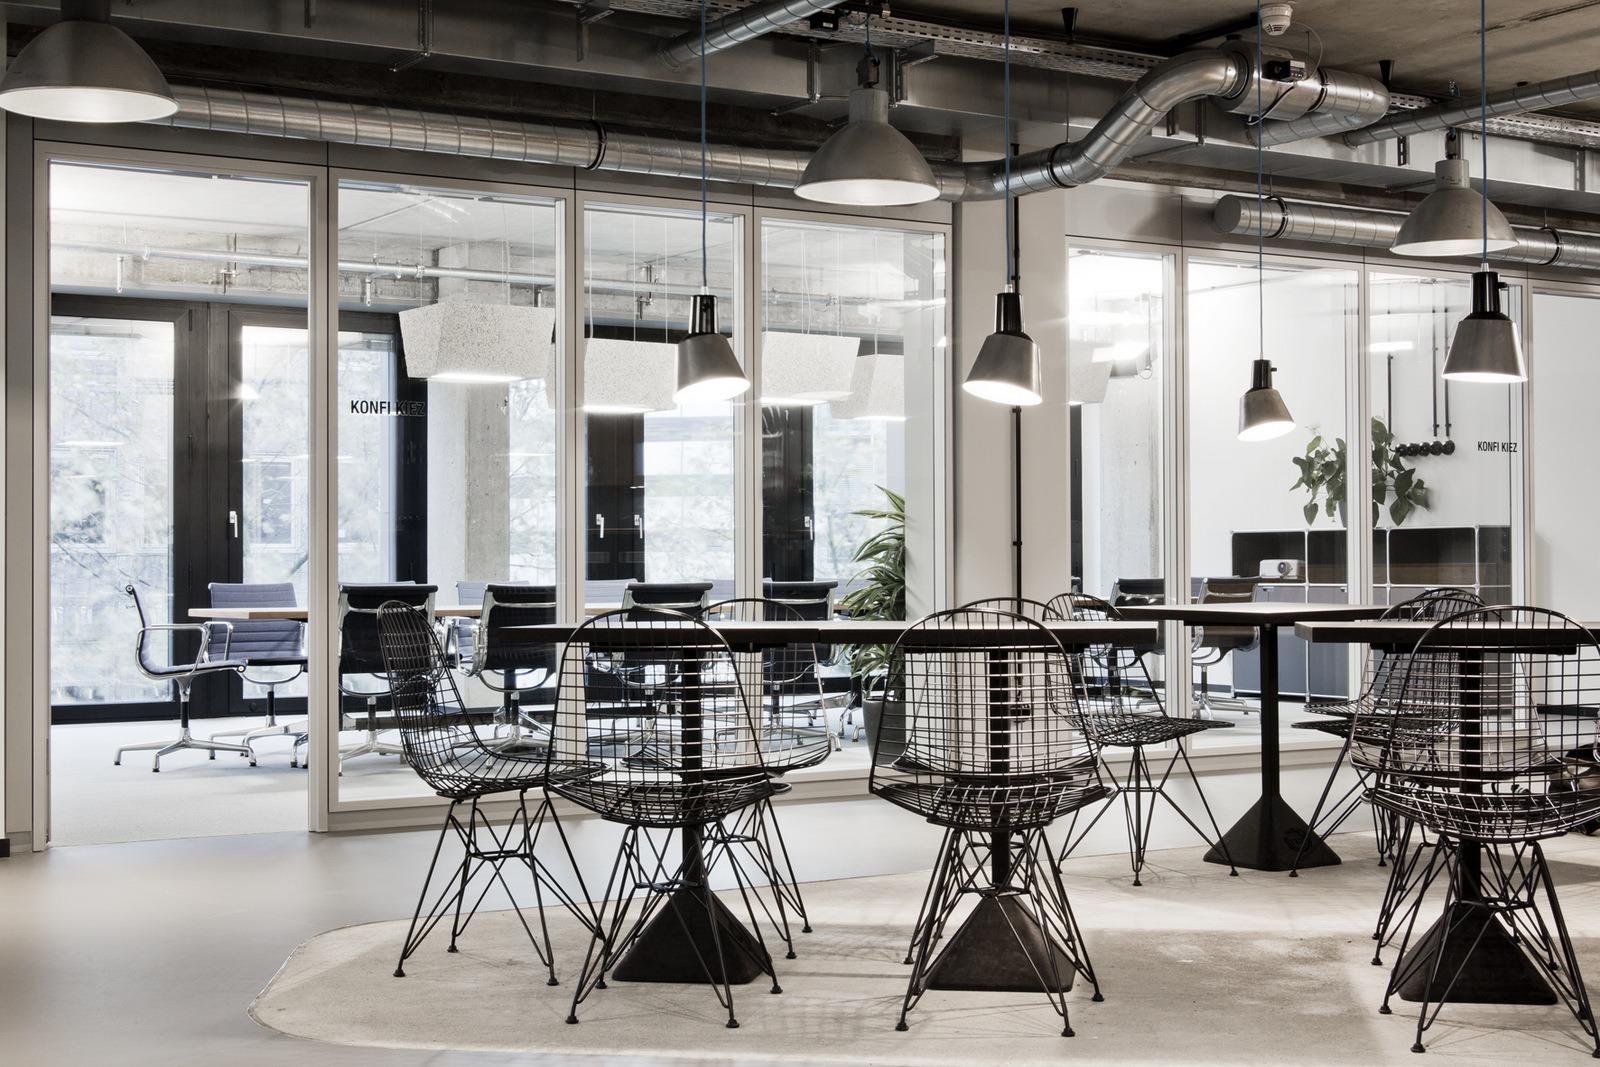 project-collins-office-hamburg-6